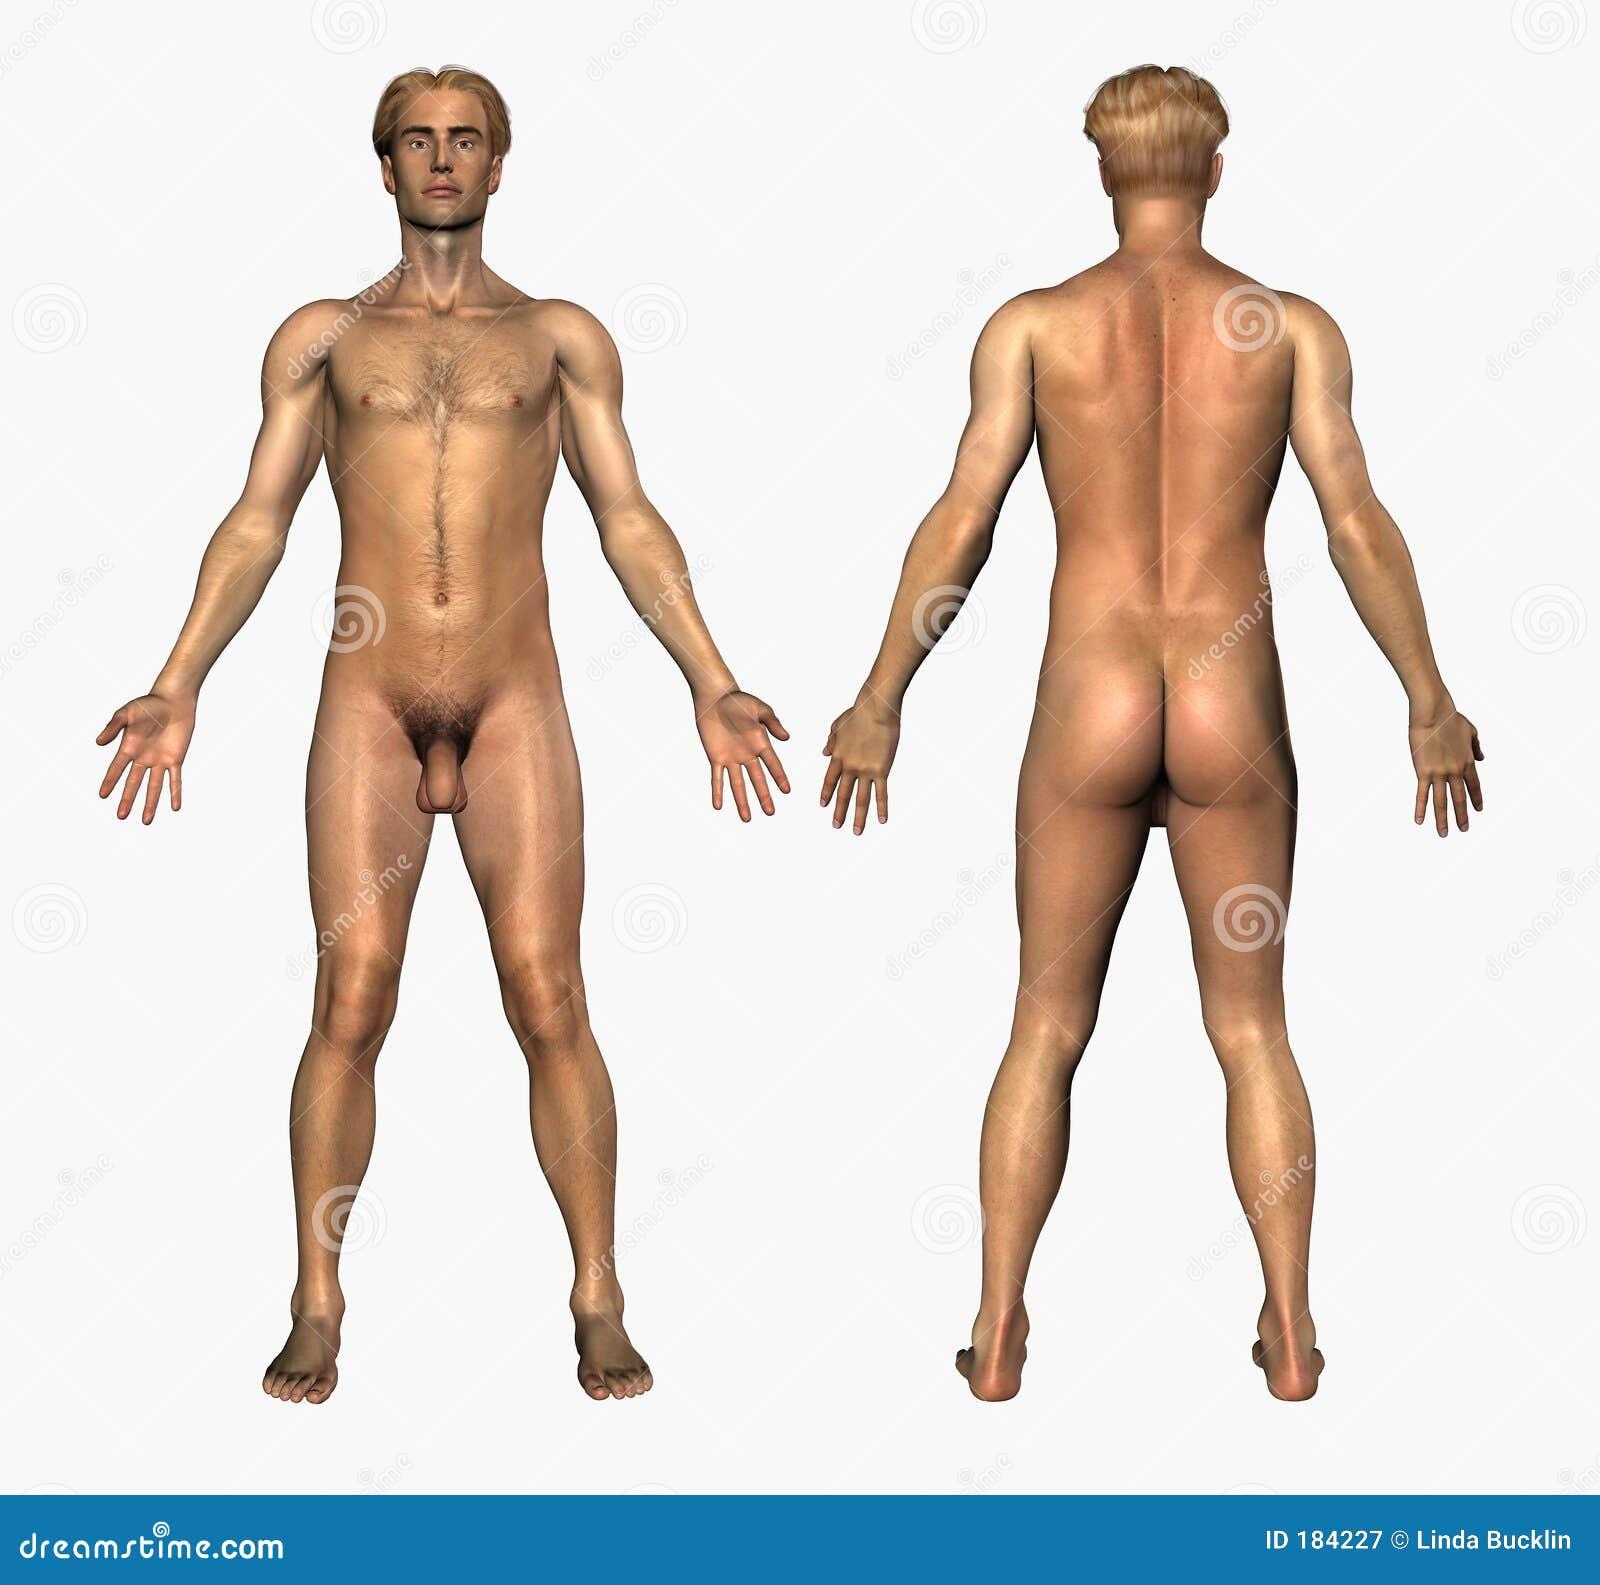 3d nude male fucking pics